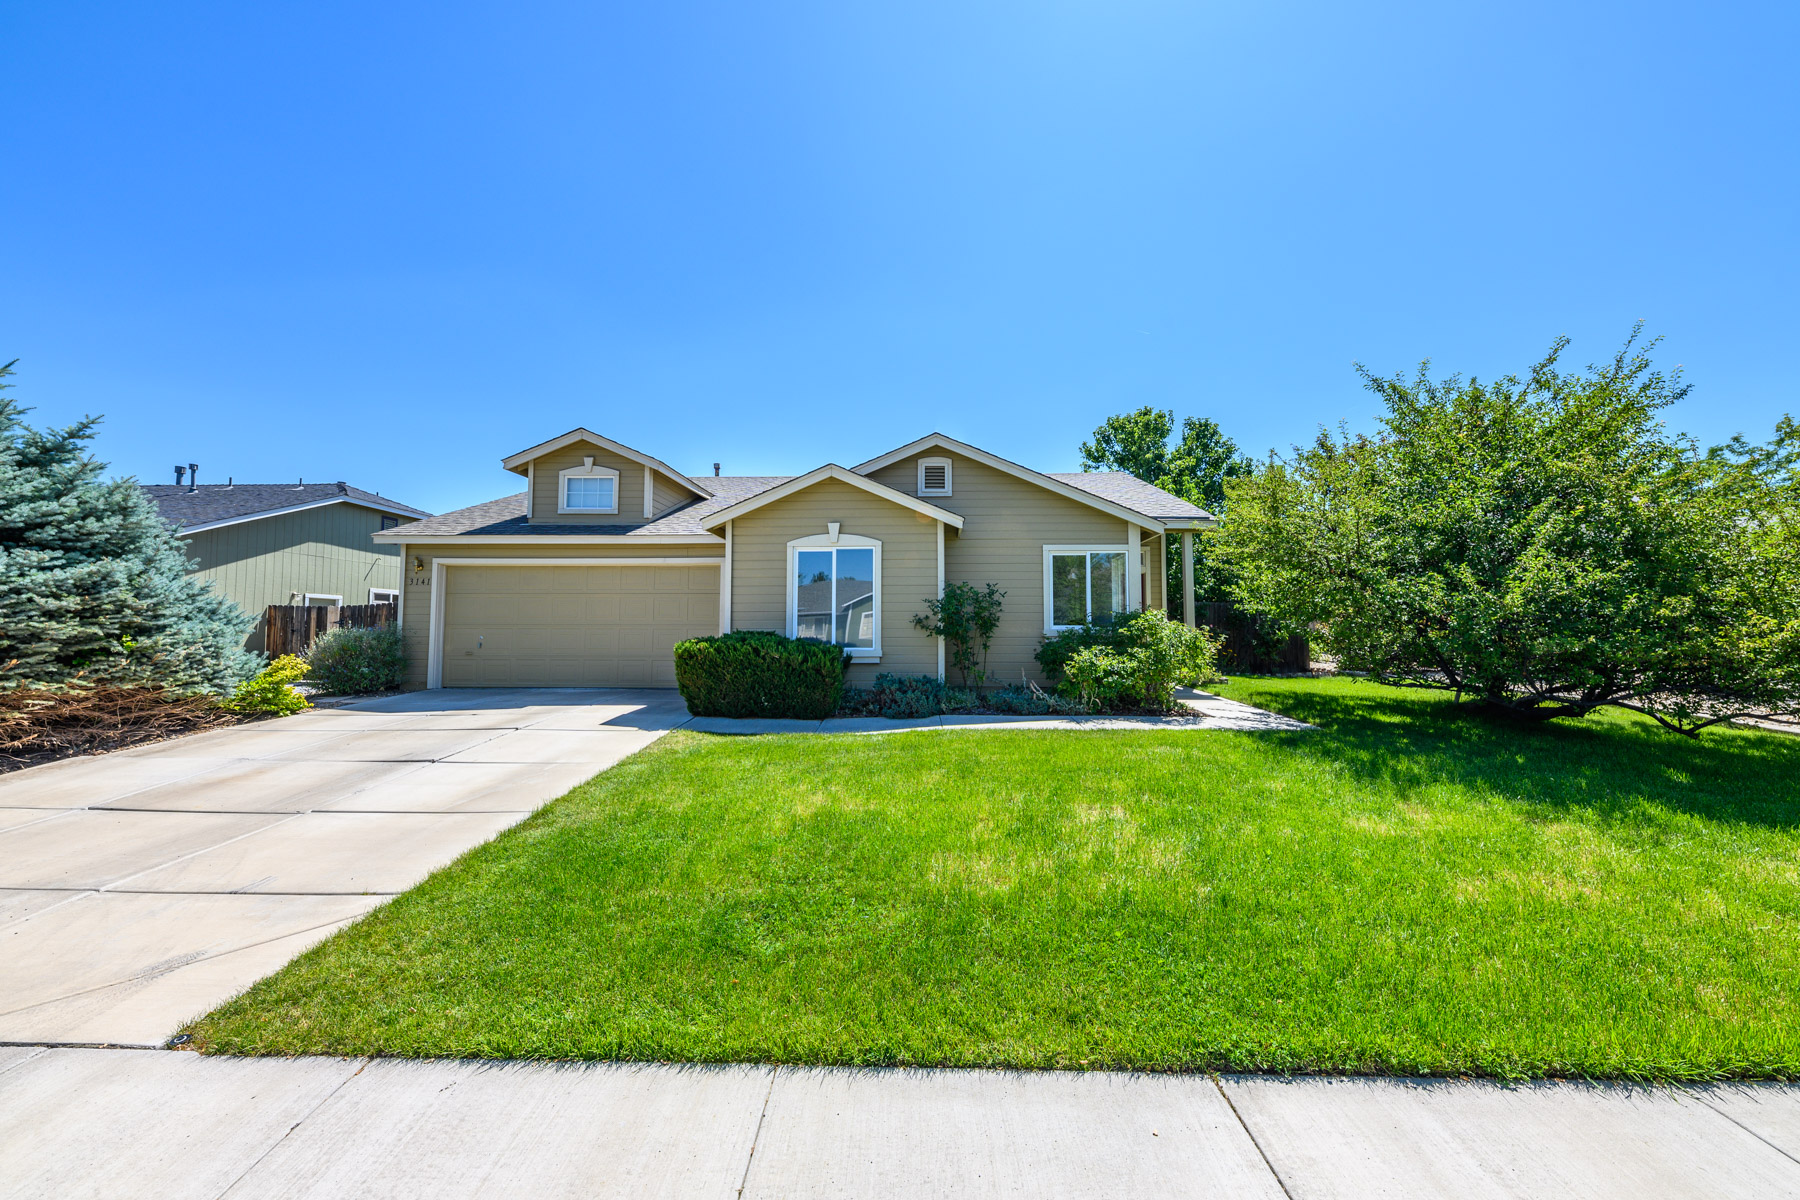 Single Family Homes por un Venta en 3141 Manzana Ct., Sparks, Nevada 3141 Manzana Ct. Sparks, Nevada 89436 Estados Unidos